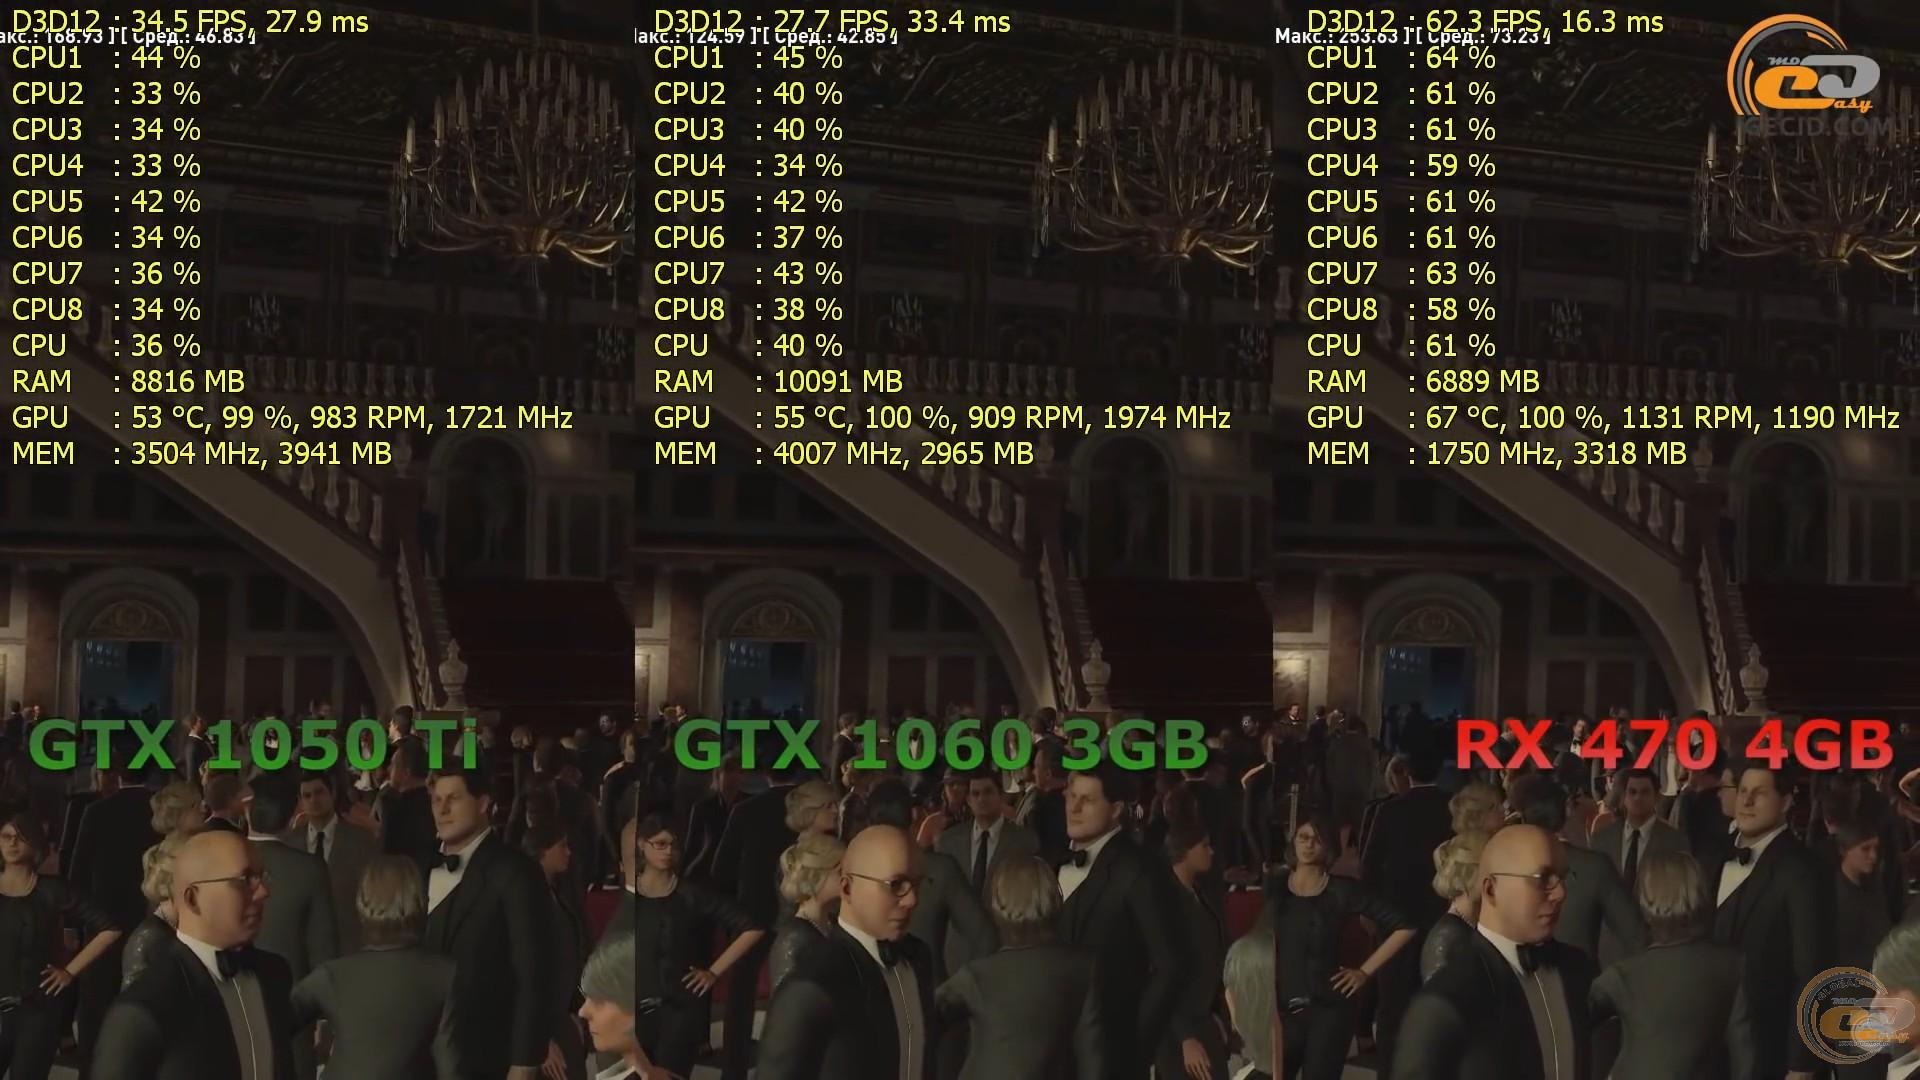 NVIDIA GeForce GTX 1050 Ti vs GTX 1060